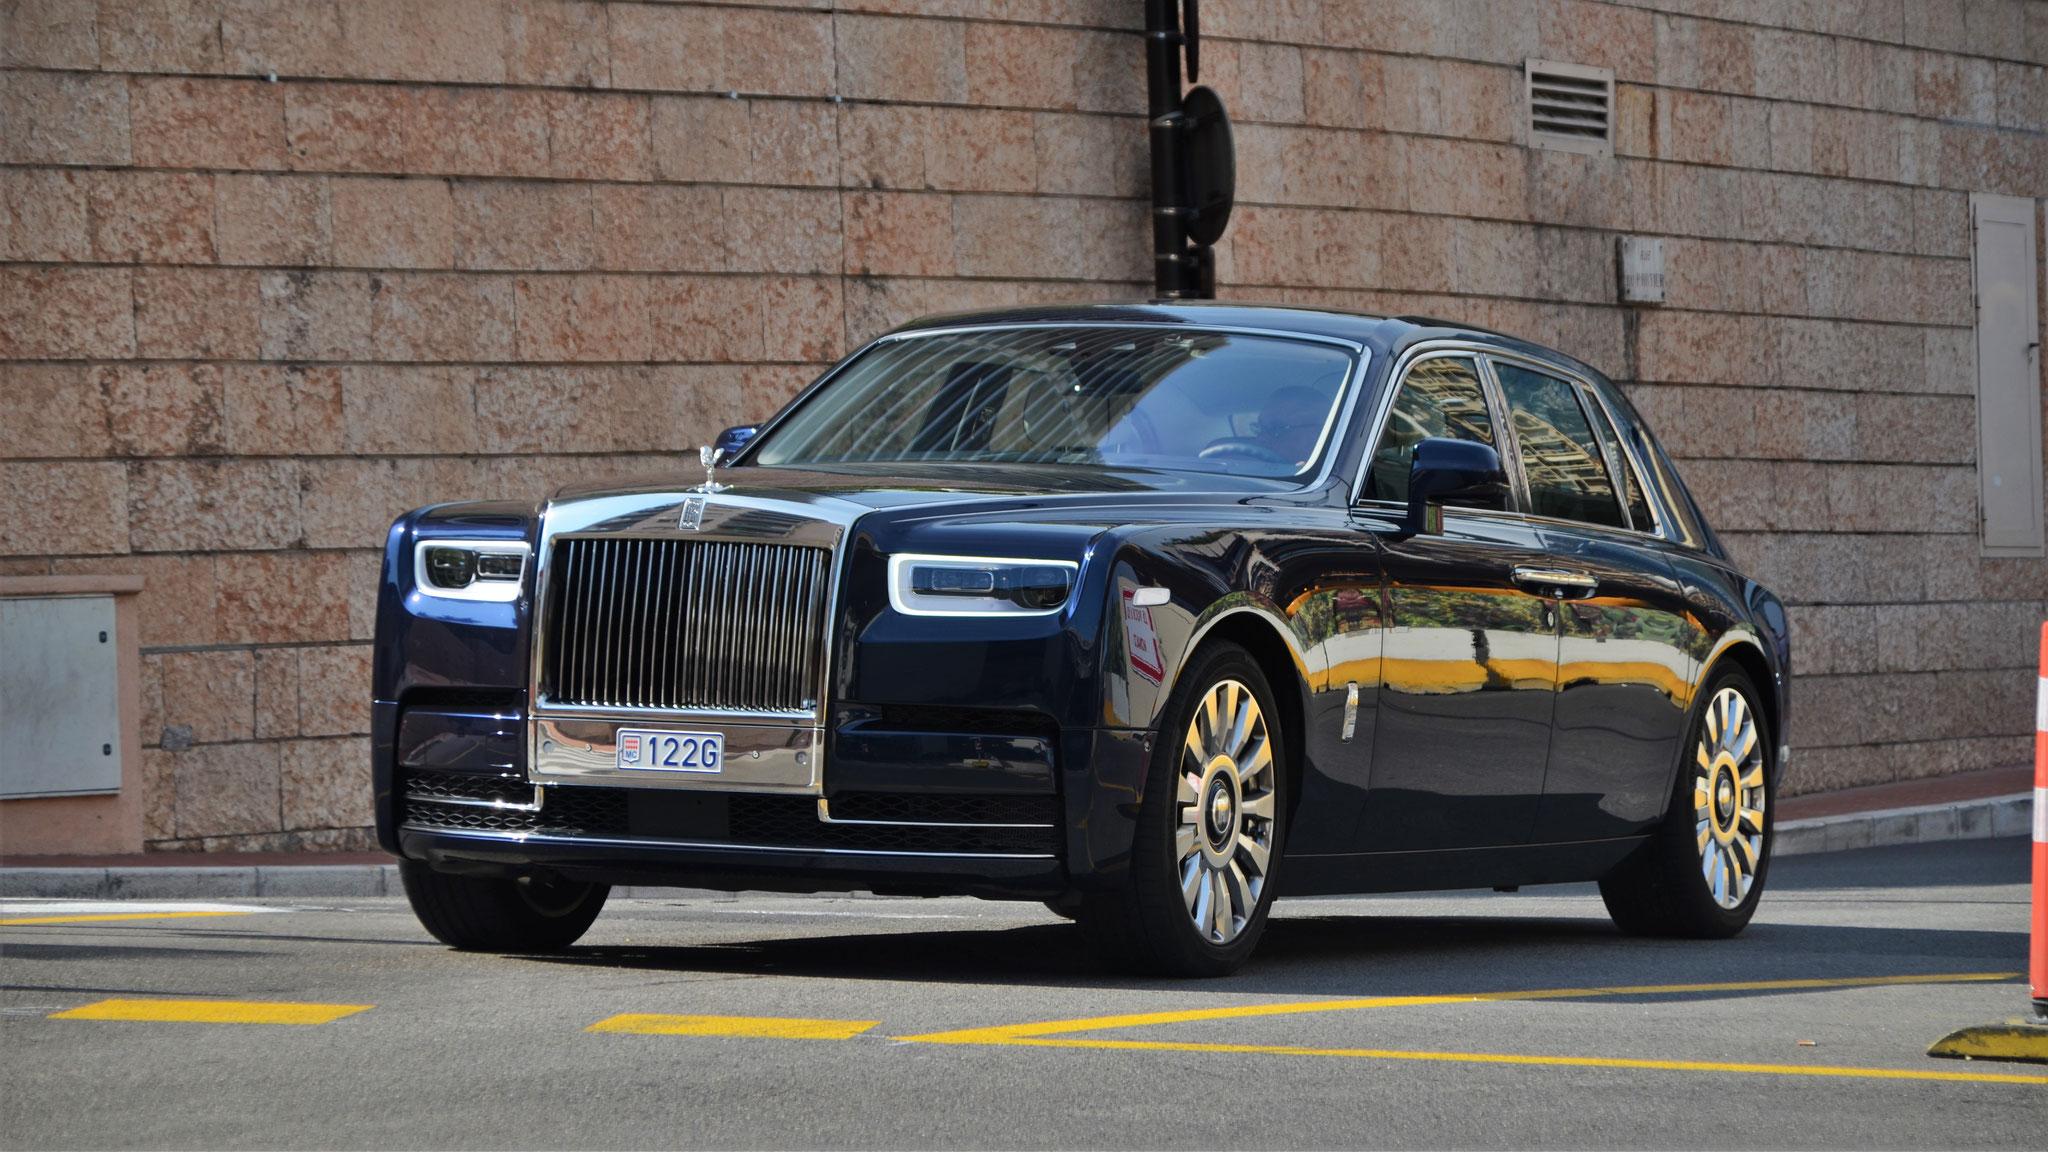 Rolls Royce Phantom - 122G (MC)